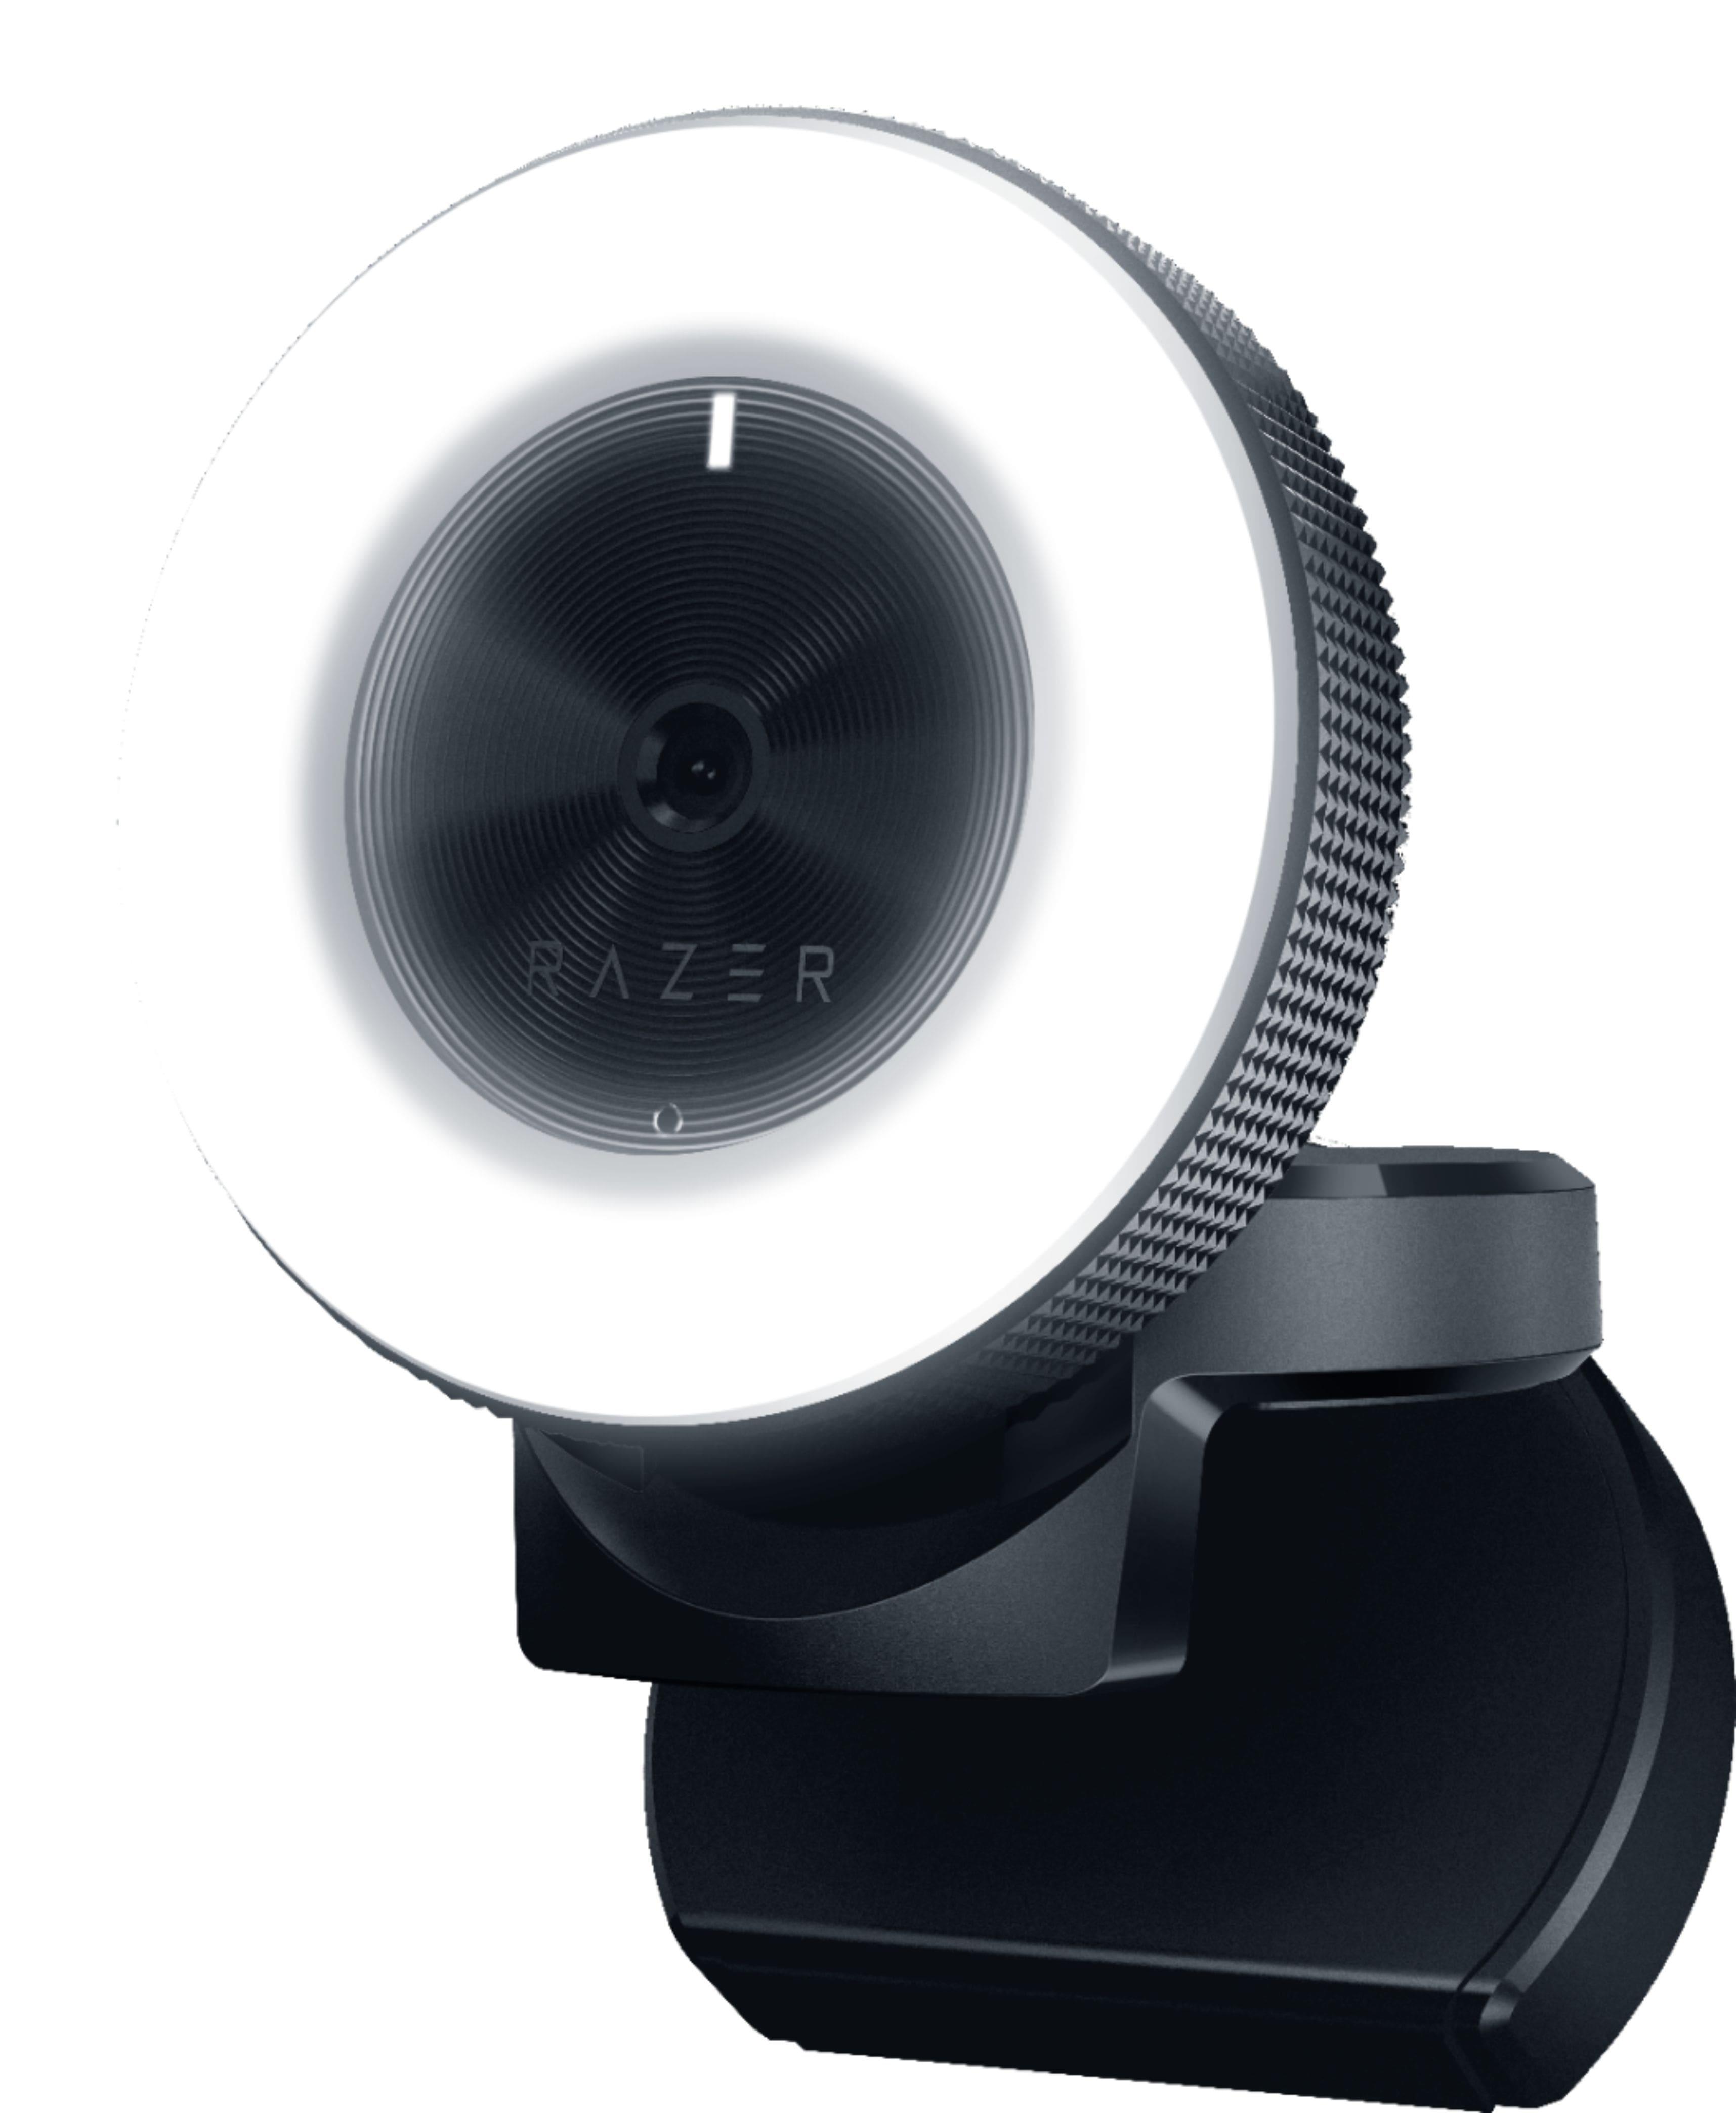 Razer Kiyo Full HD 1080p Streaming Webcam w/ Ring Light & Auto Focus